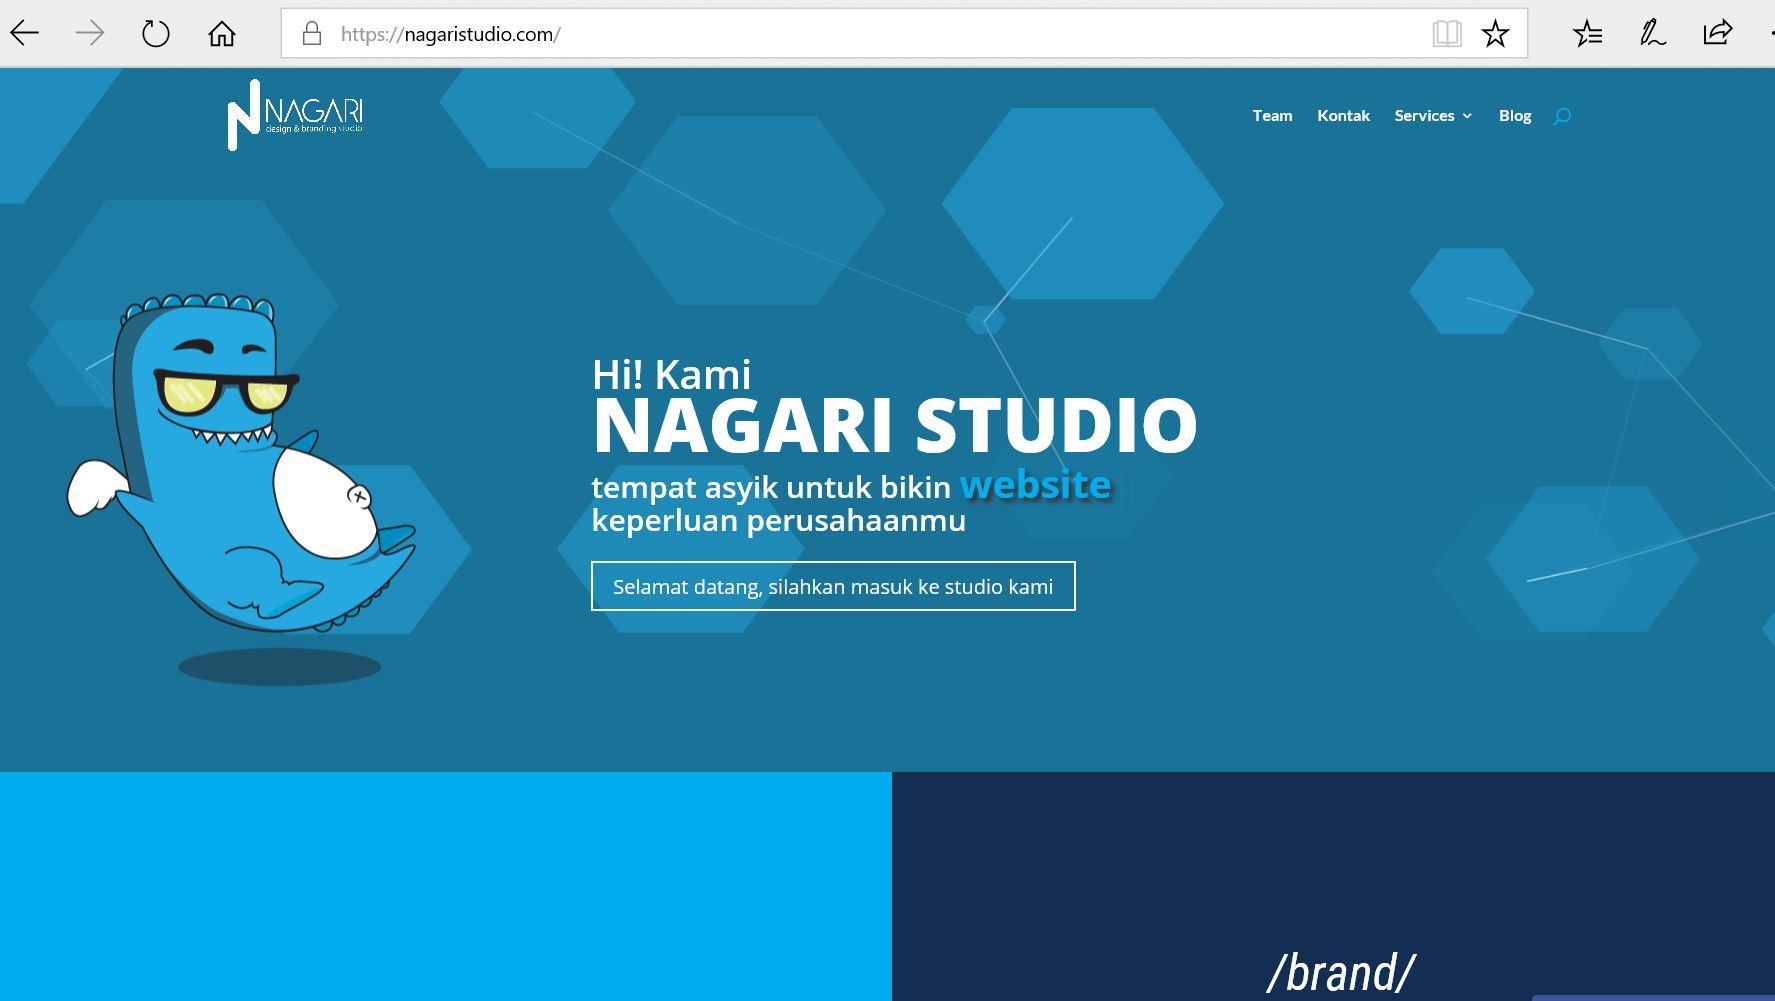 Nagari Studio